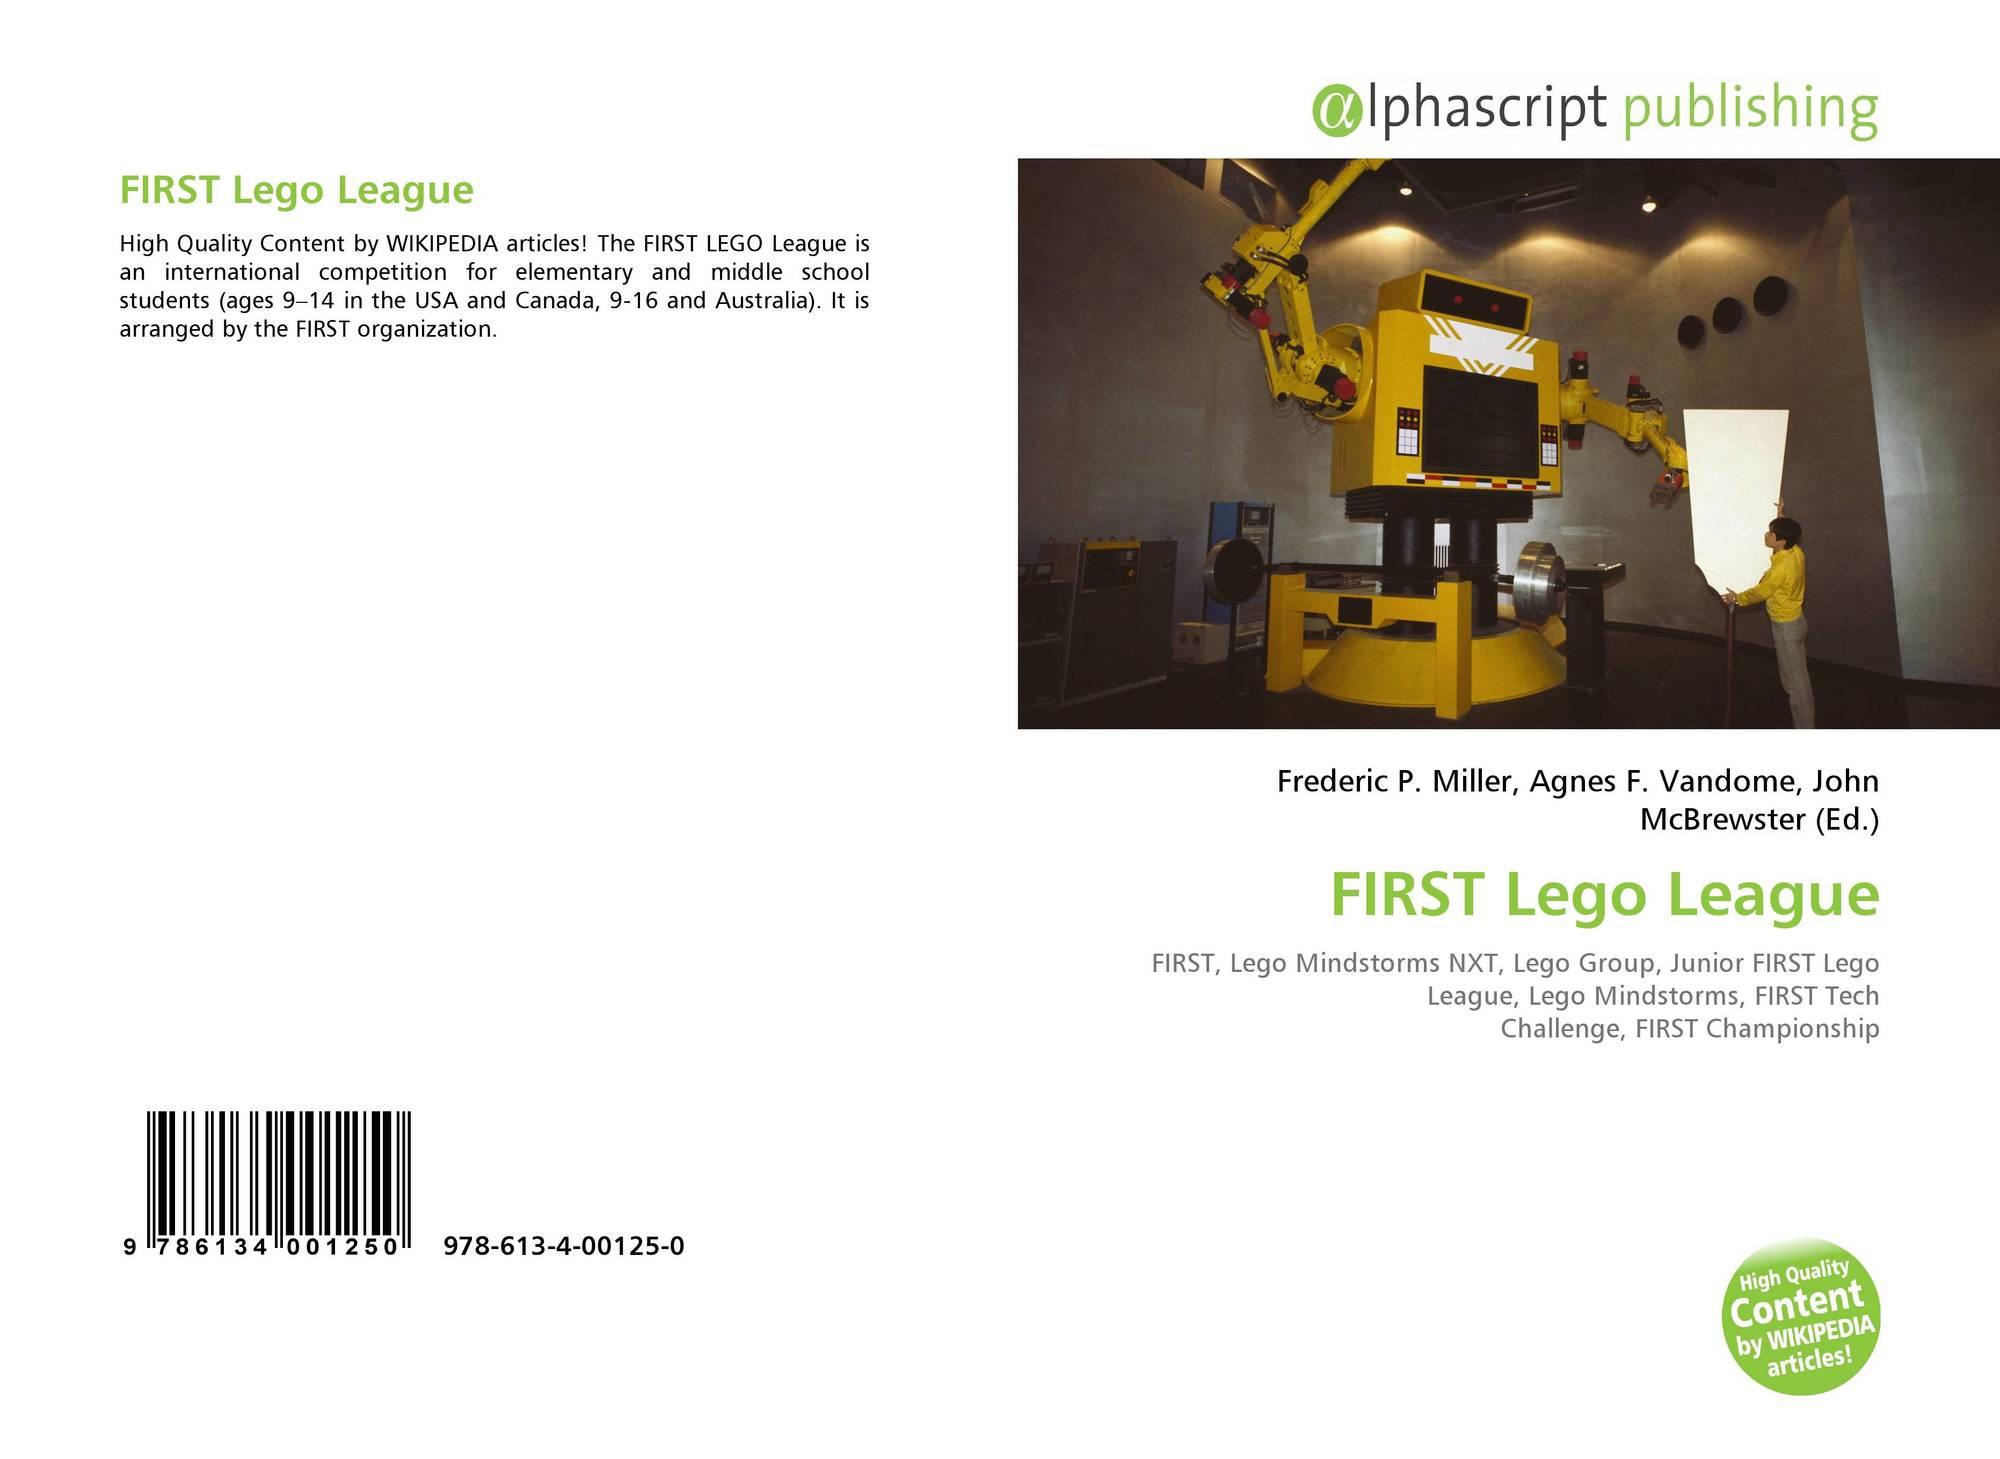 FIRST Lego League, 978-613-4-00125-0, 6134001252 ,9786134001250